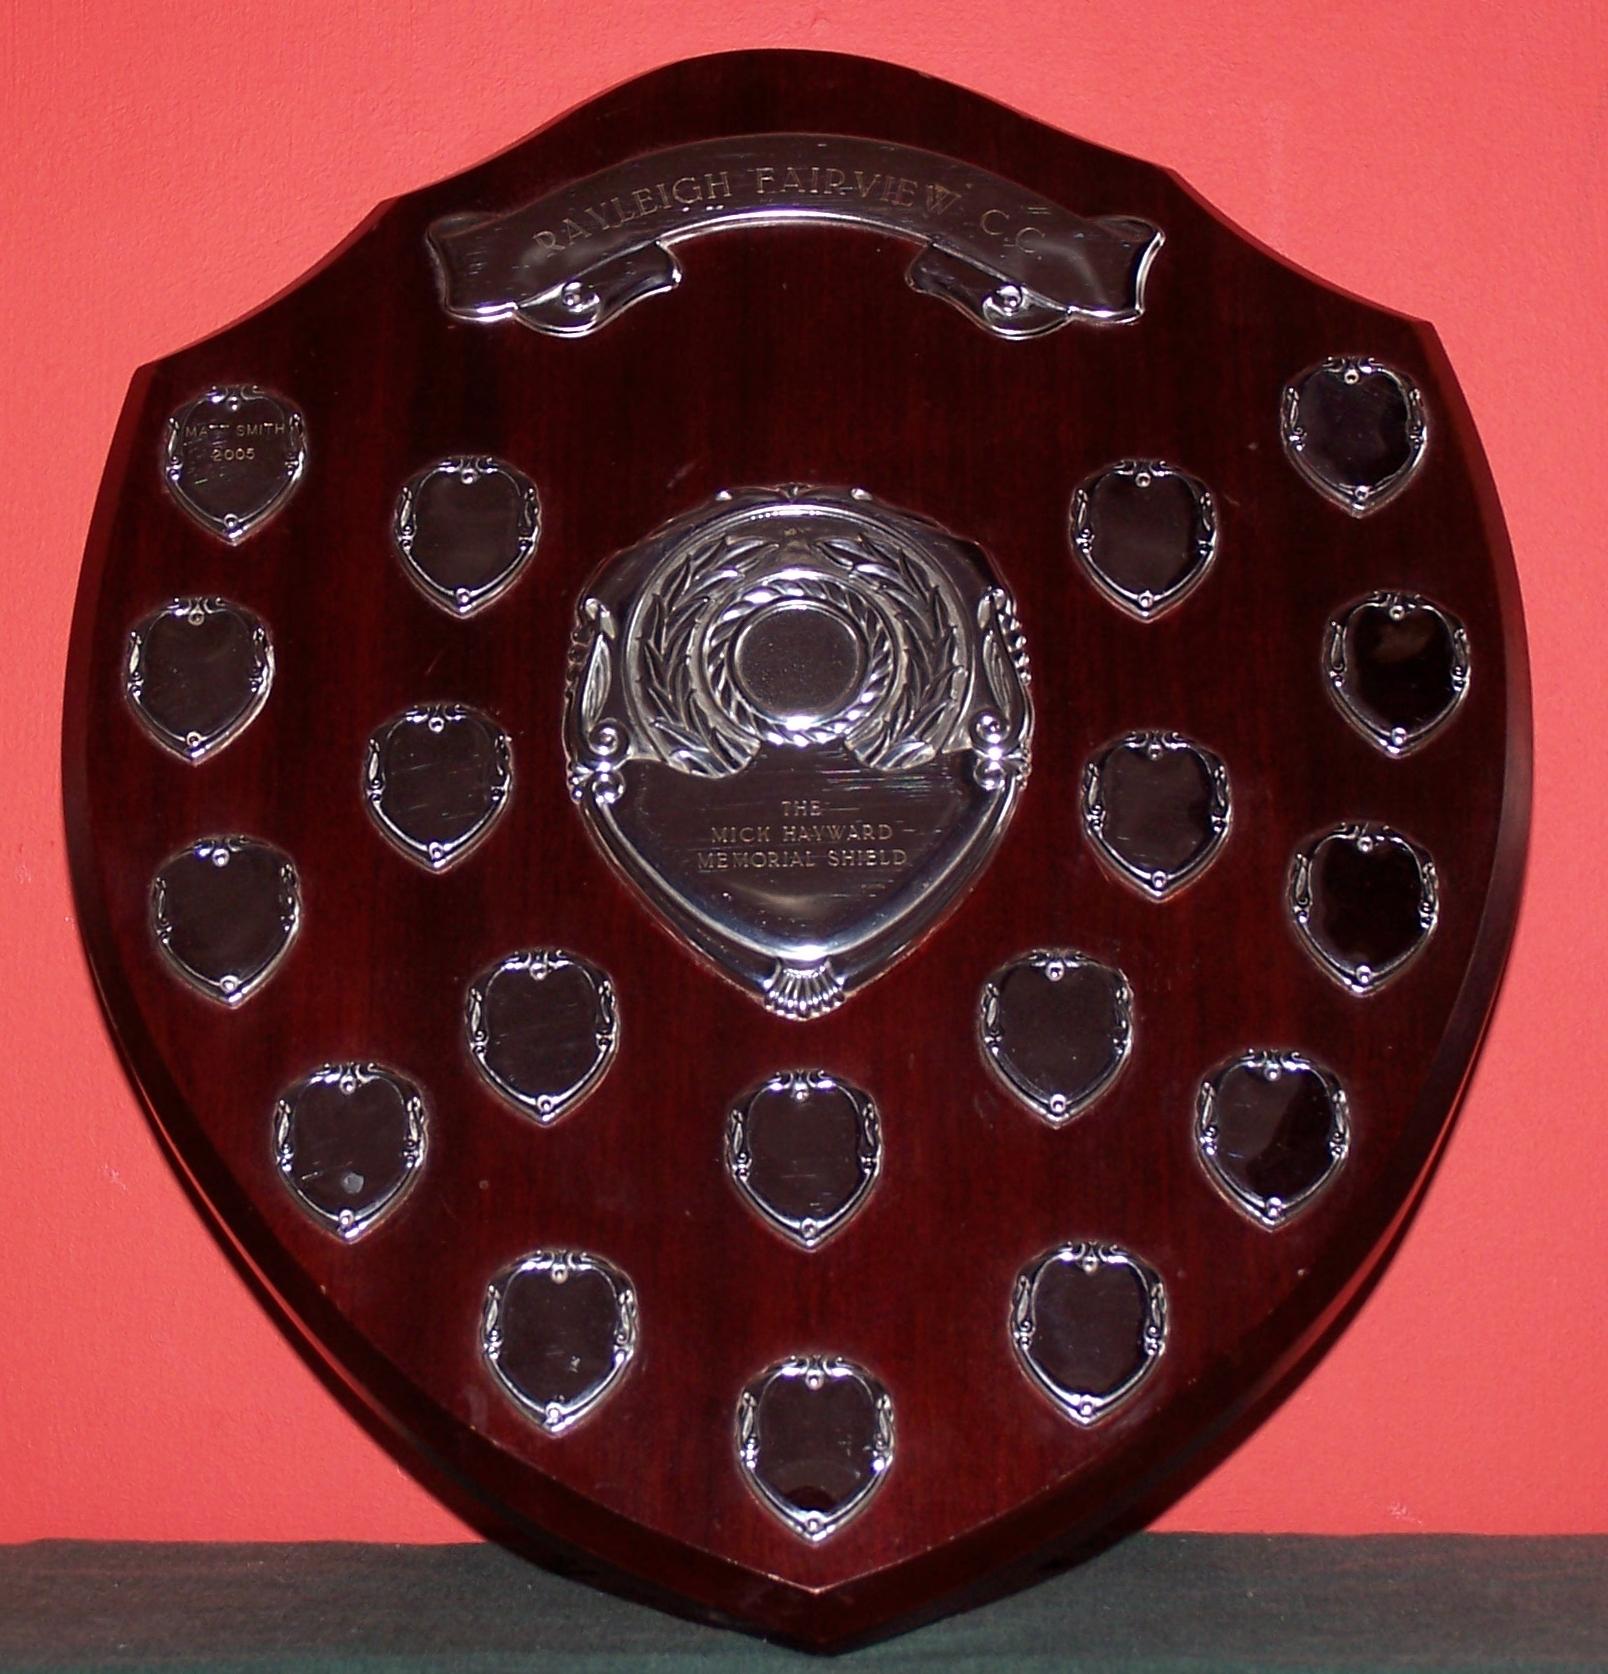 Mick Hayward Memorial Shield